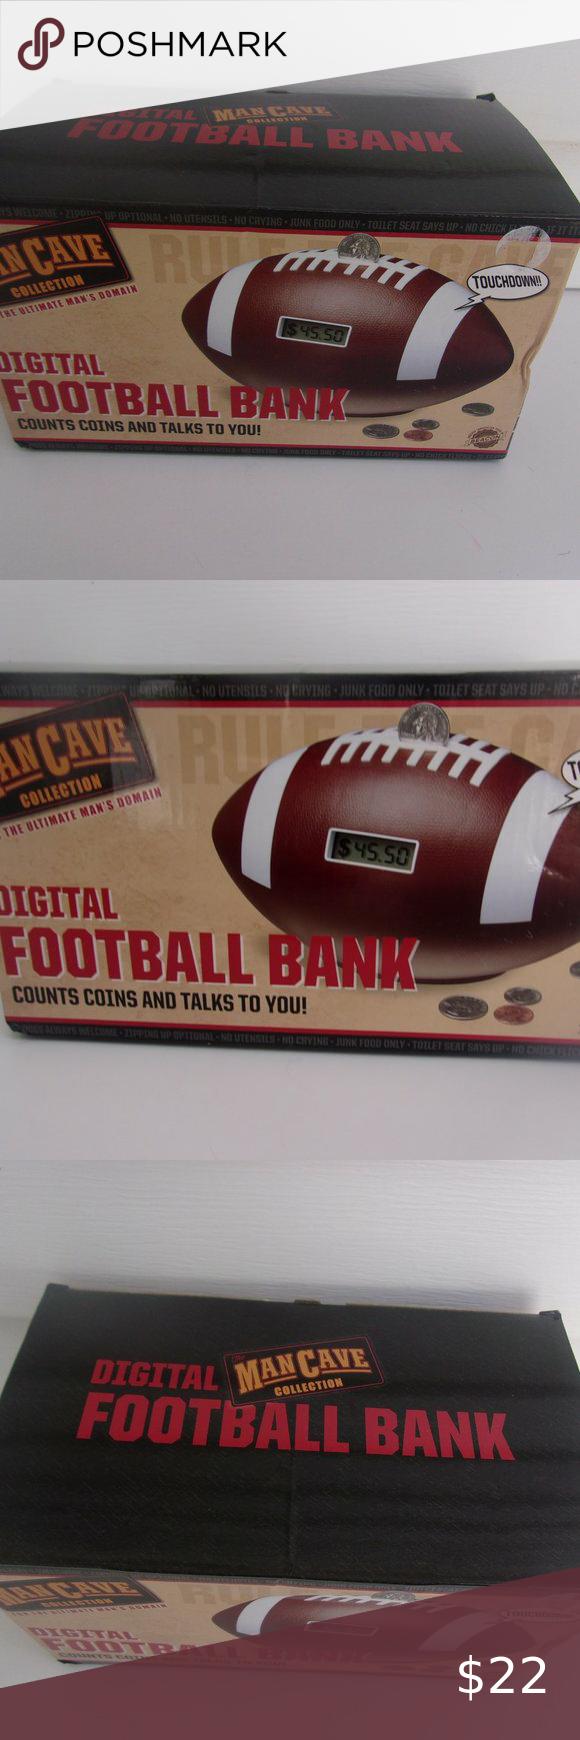 Eb Brands Man Cave Football Digital Bank New In 2020 Brand Man Cave Football